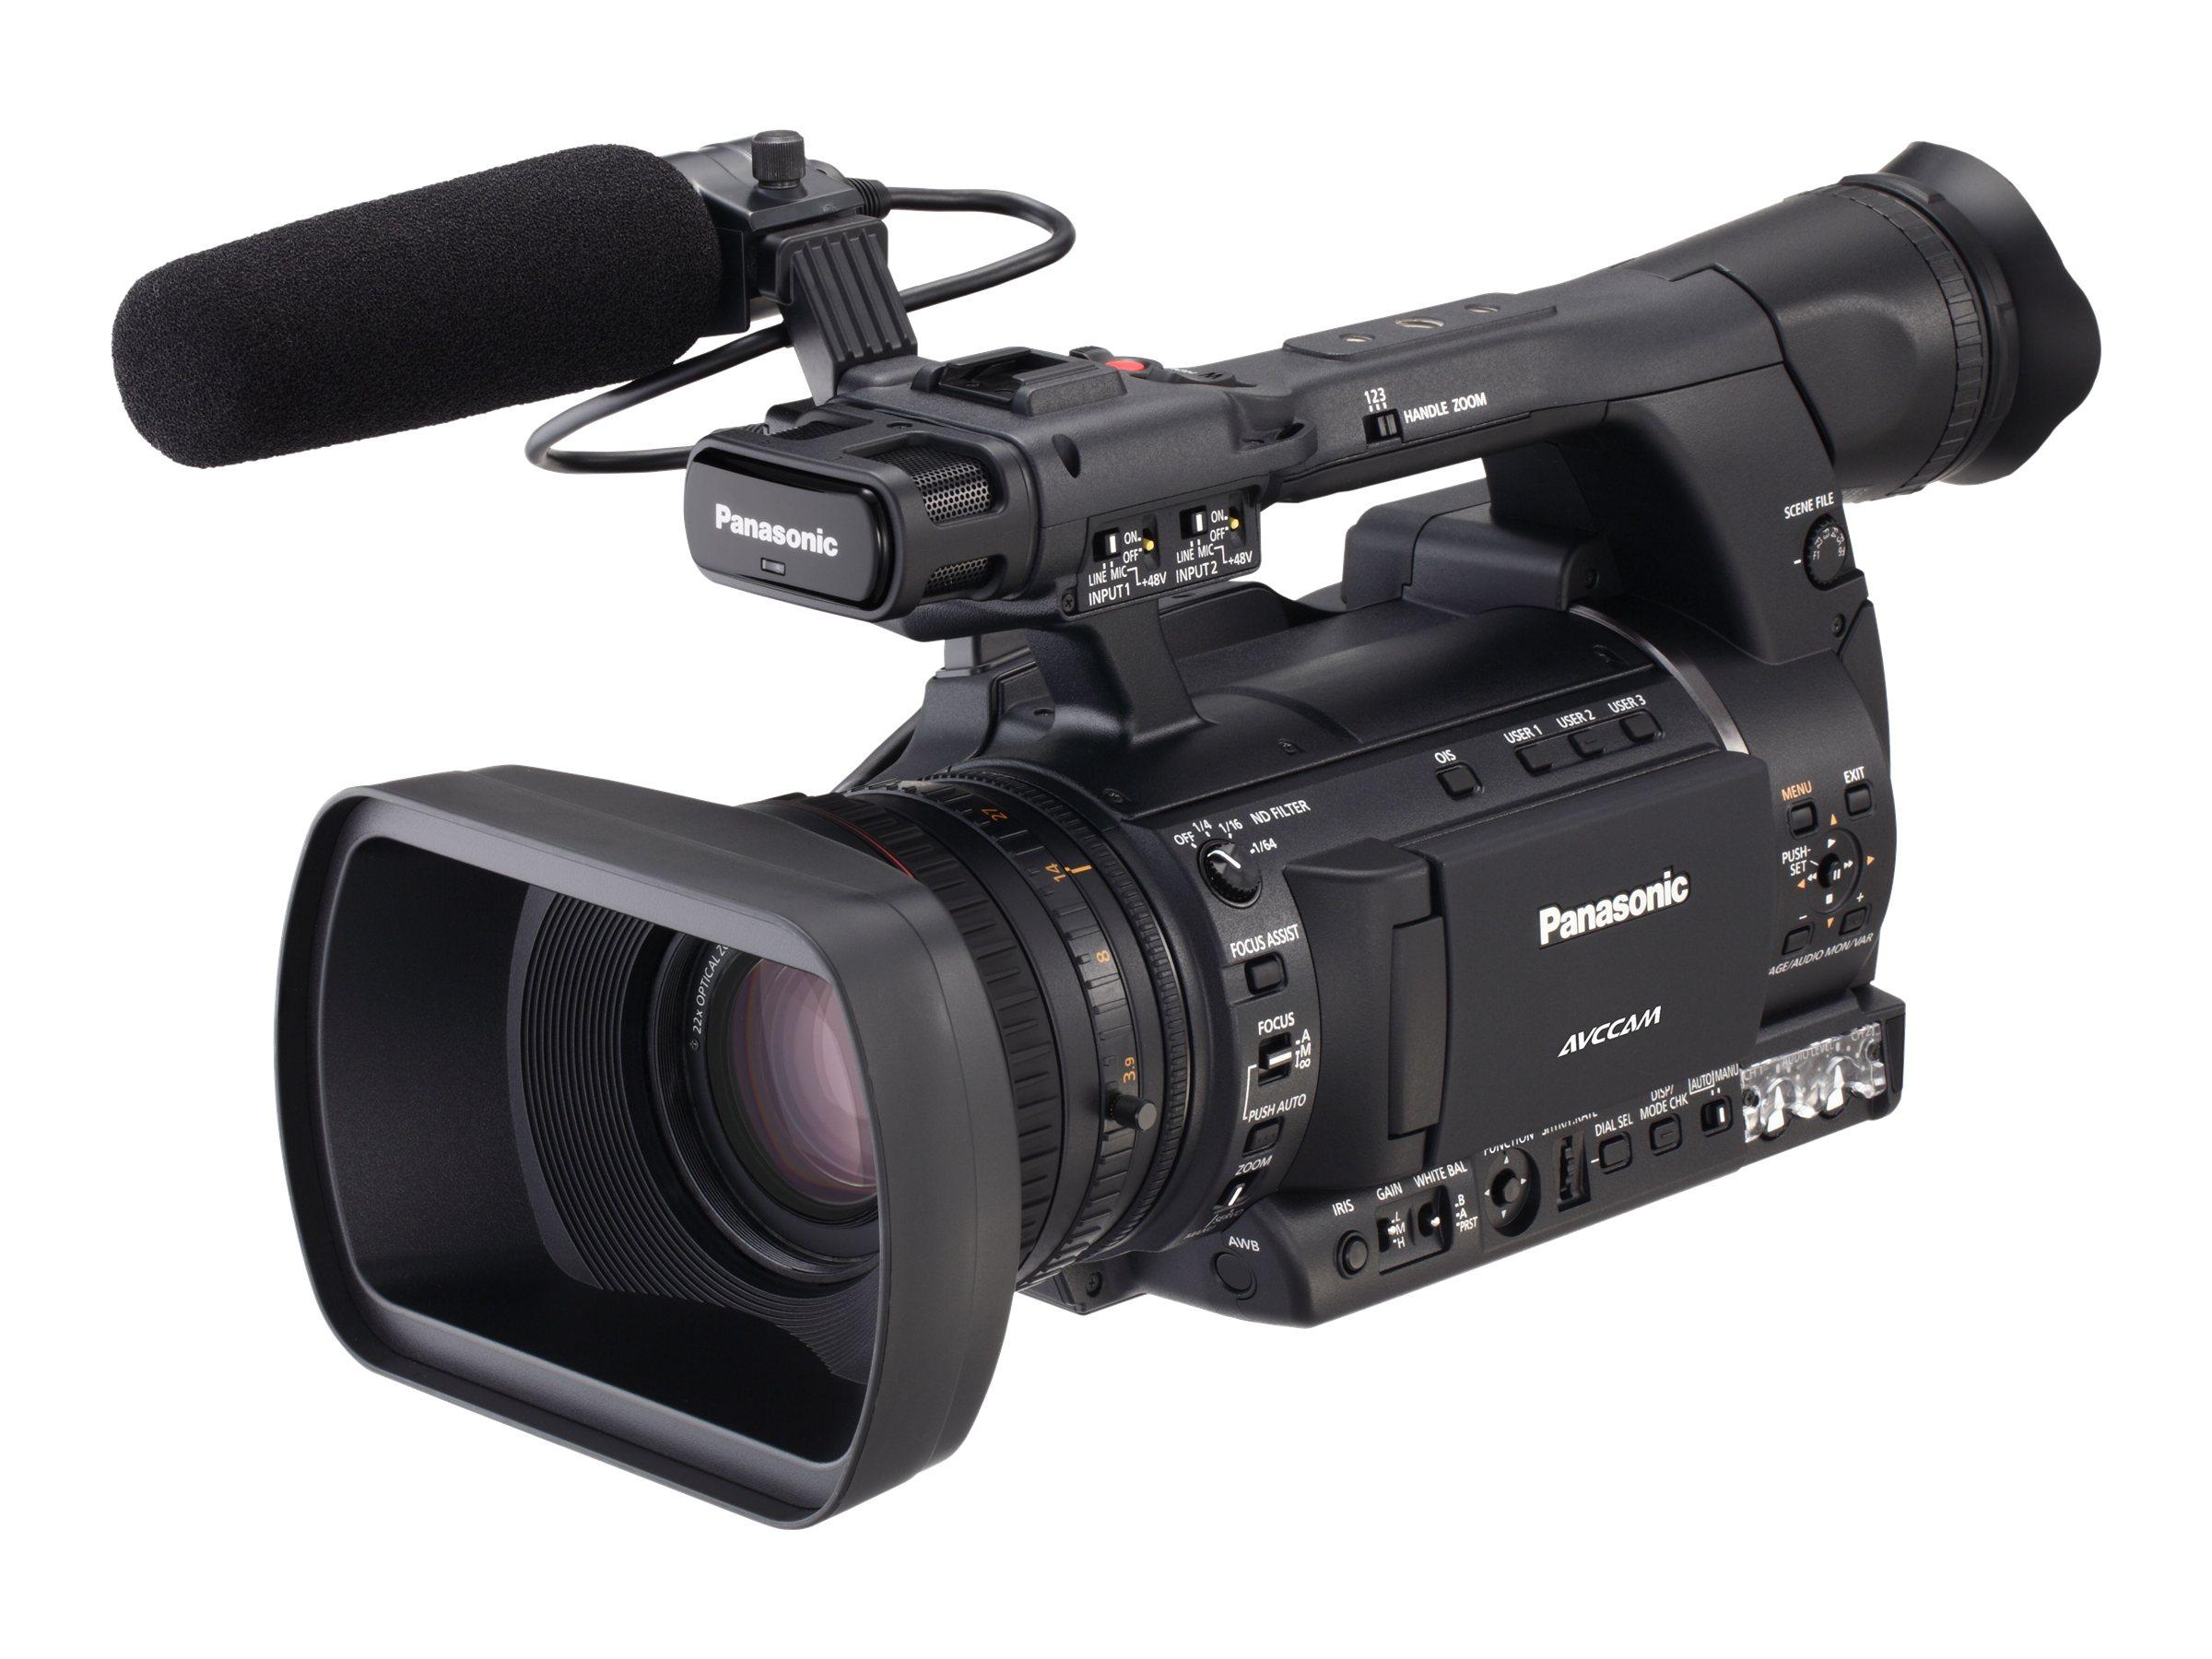 Panasonic AG-AC160 AVCCAM HD Handheld Camcorder